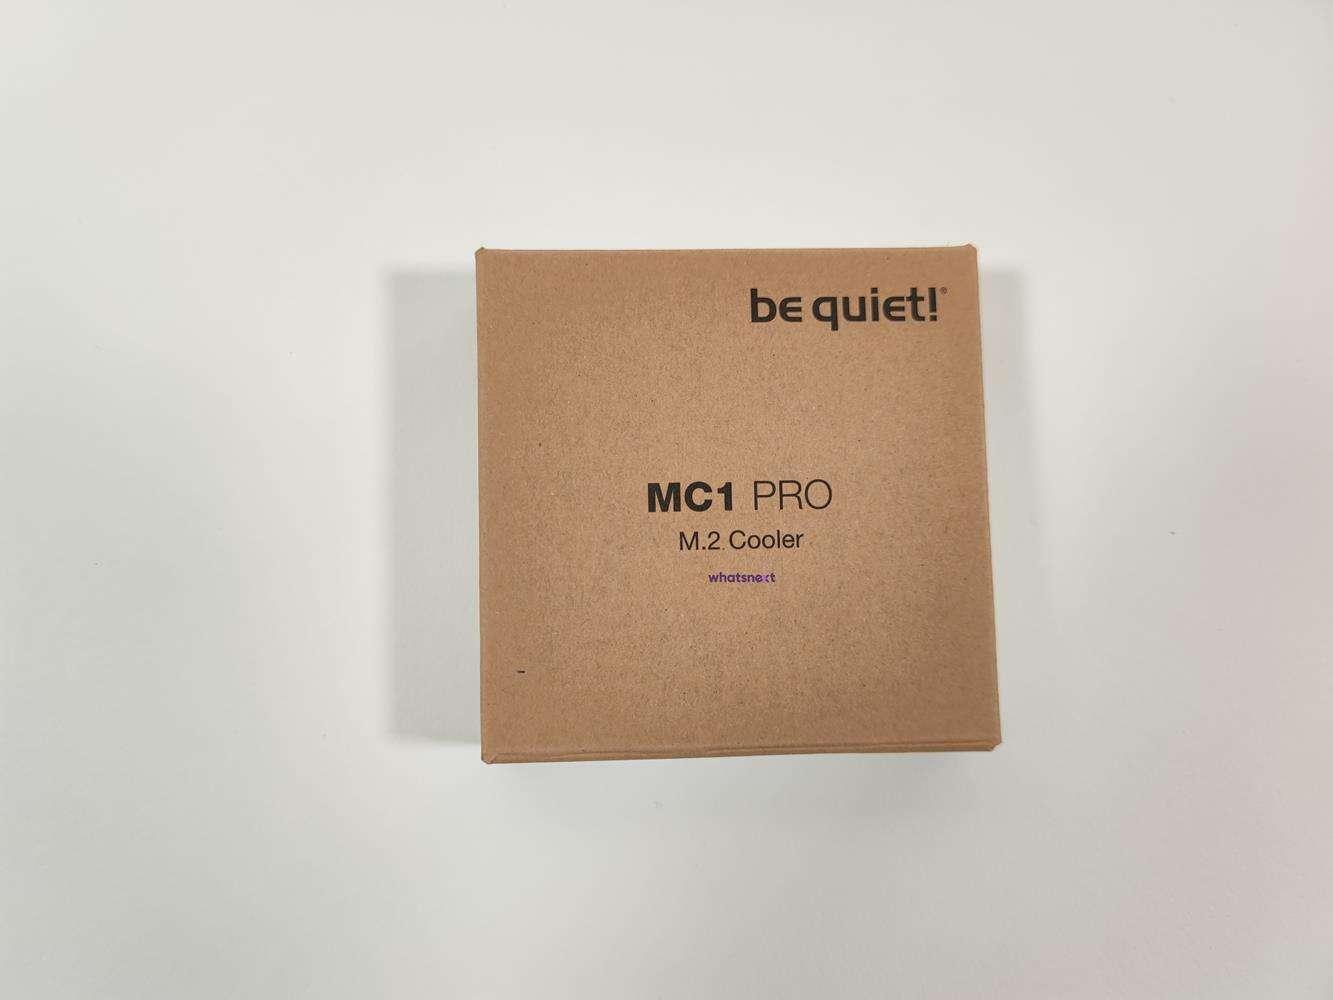 test be quiet! MC1 Pro, recenzja be quiet! MC1 Pro, opinia be quiet! MC1 Pro